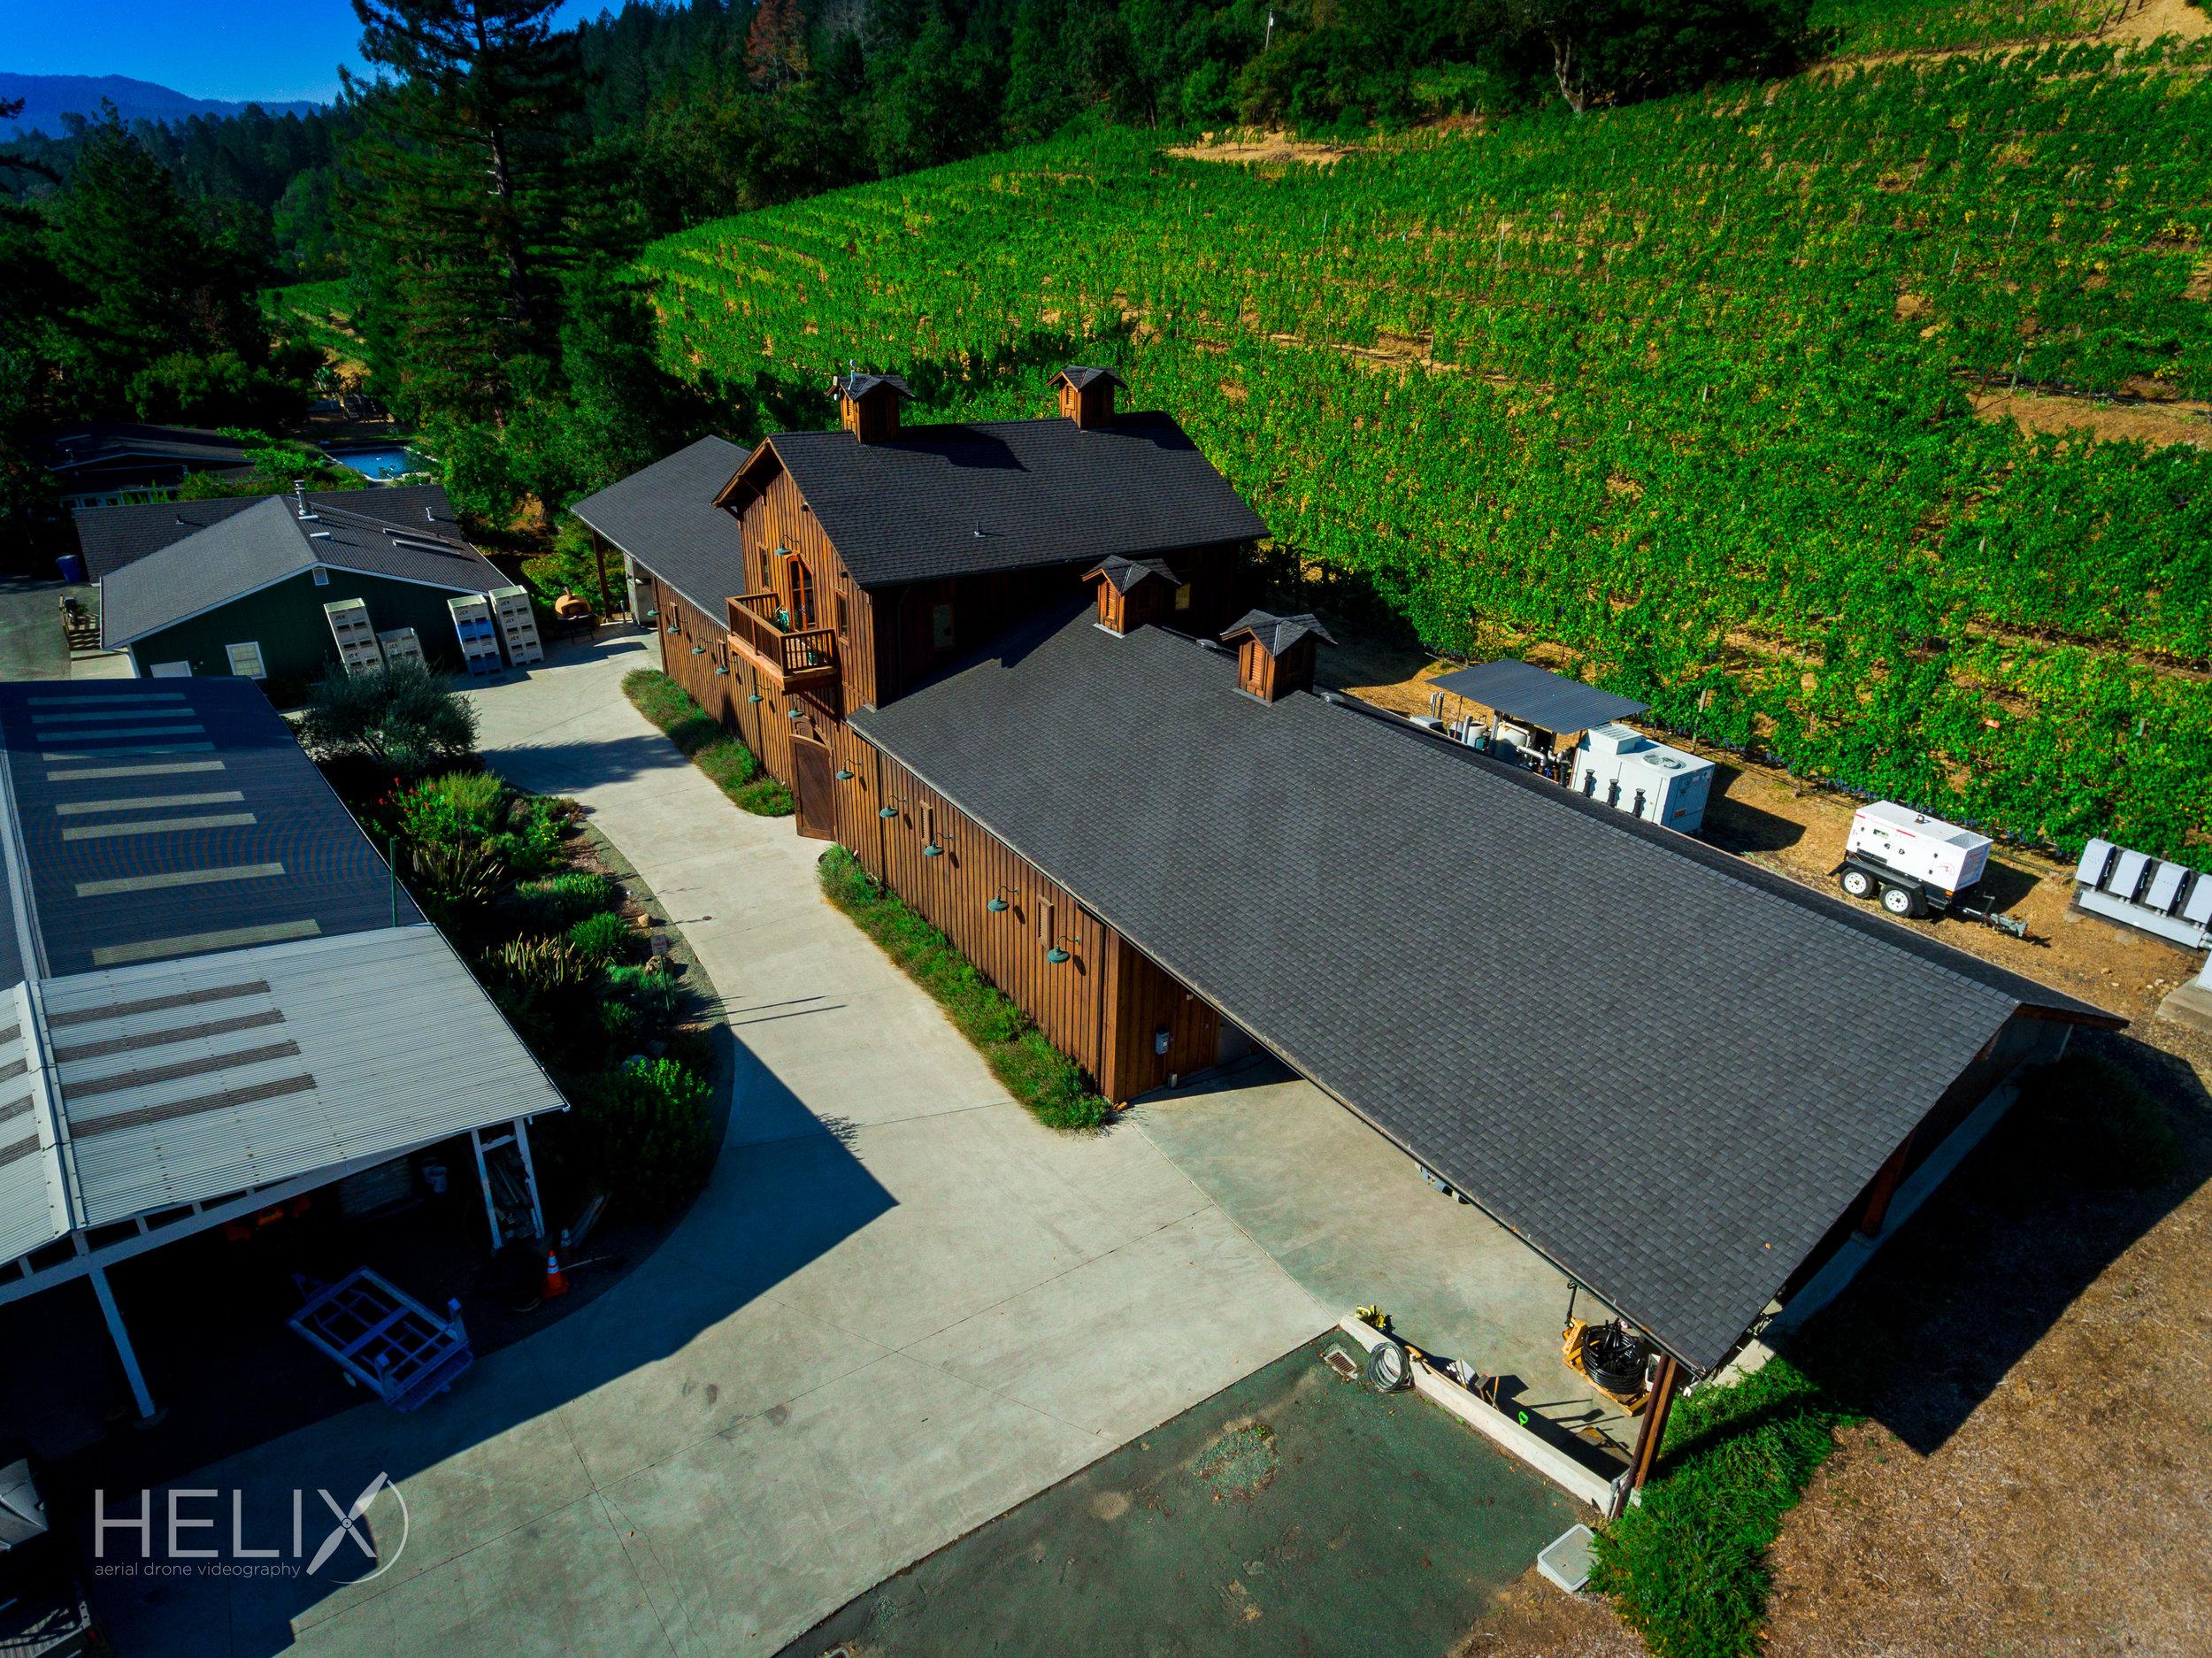 HELIX - Jerico Canyon Winery 090516-6.jpg